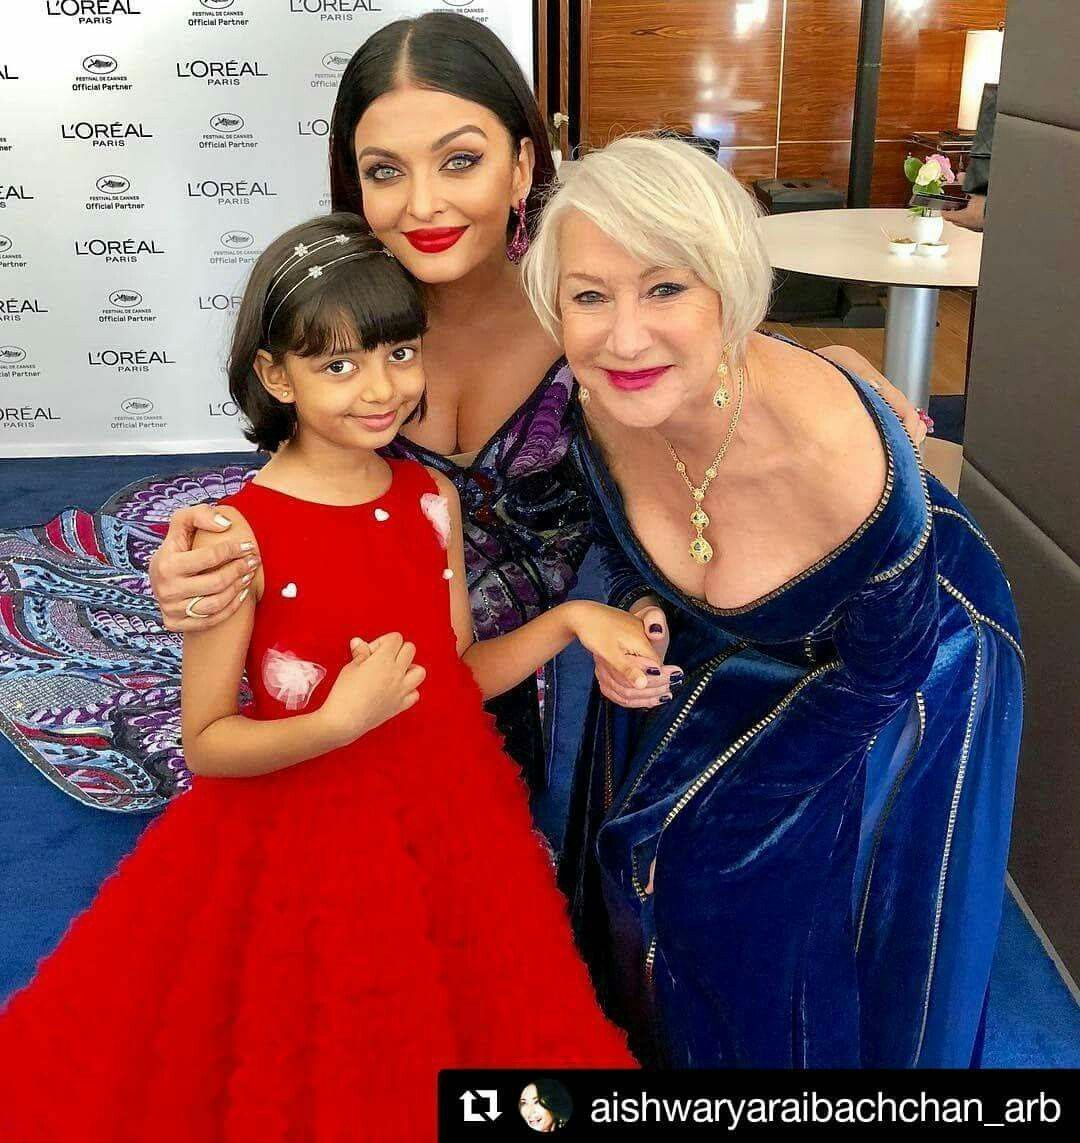 Aishwarya Rai Bachchan With Her Daughter At Cannes 2018 Aishwarya Rai Bachchan Bollywood Celebrities Actress Aishwarya Rai